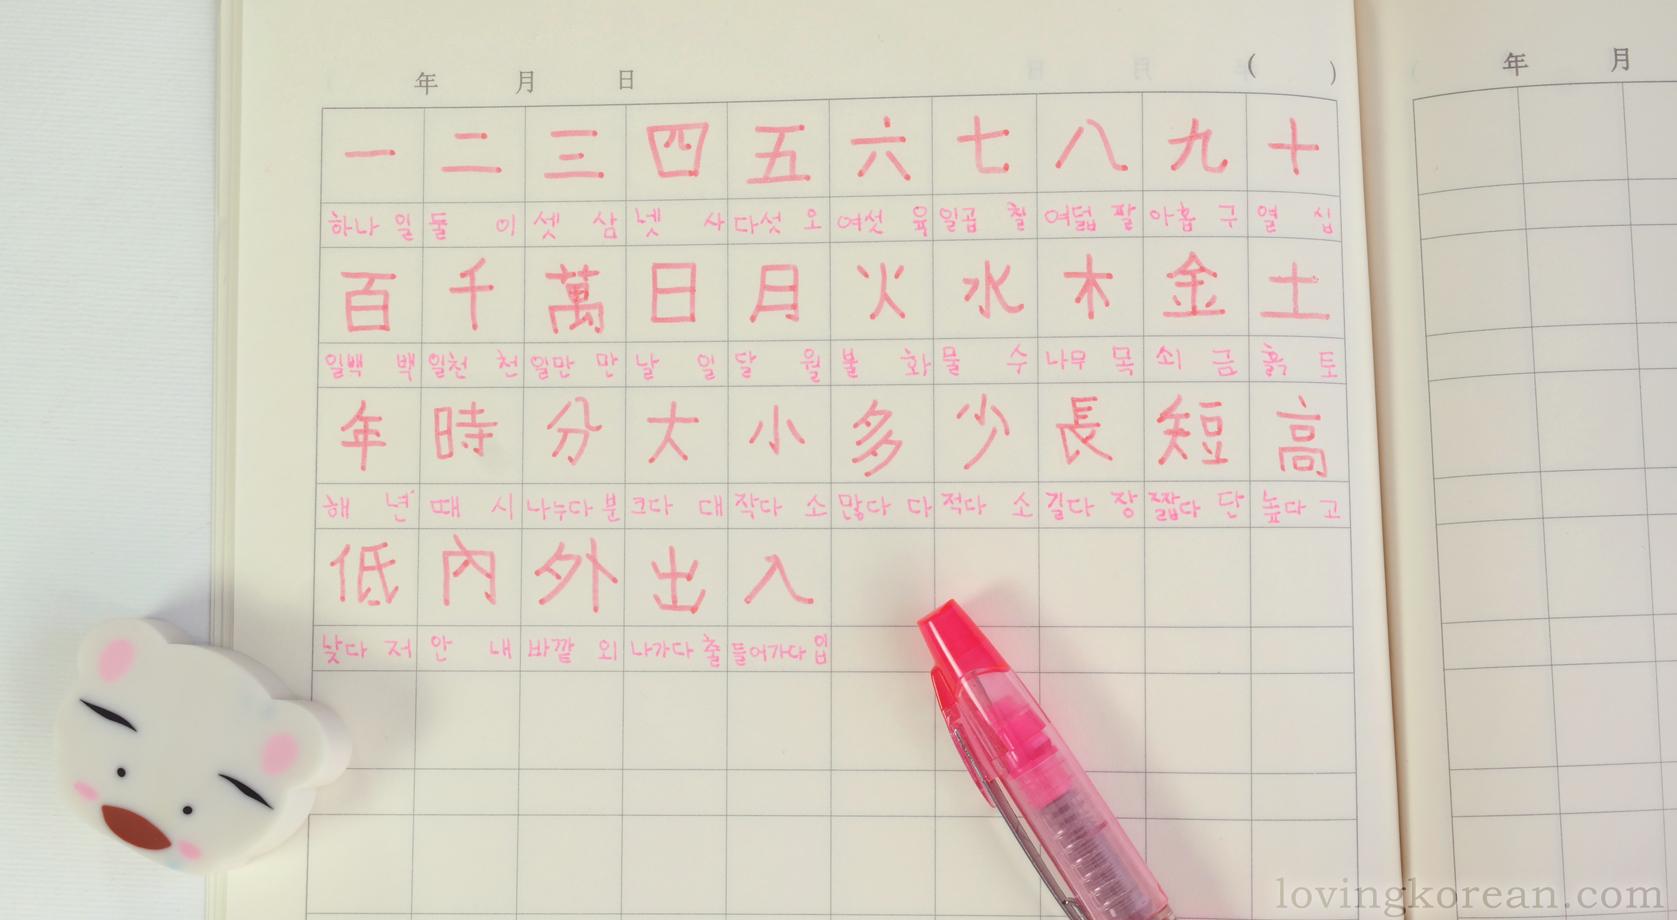 Korean Chinese Characters Hanja Written In Morning Glory